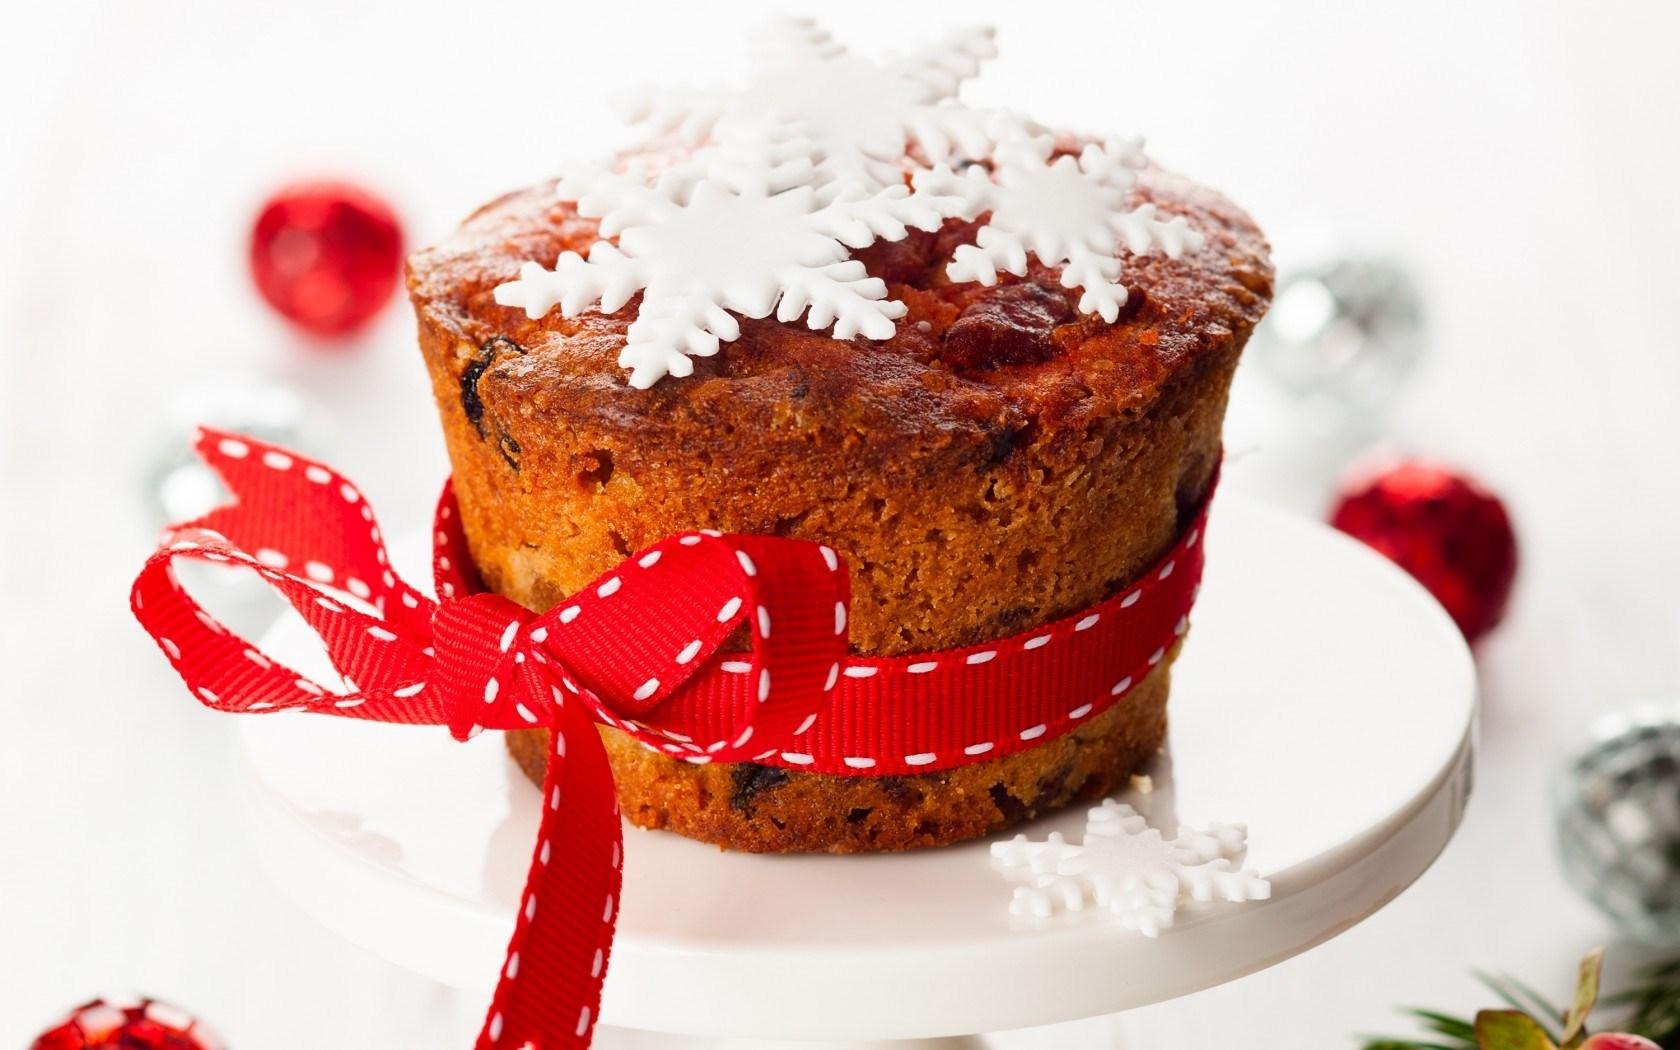 Related For Fantastic Holiday Cupcake Wallpaper. Cupcake Baking Dessert Snowflake Ribbon Holiday Christmas